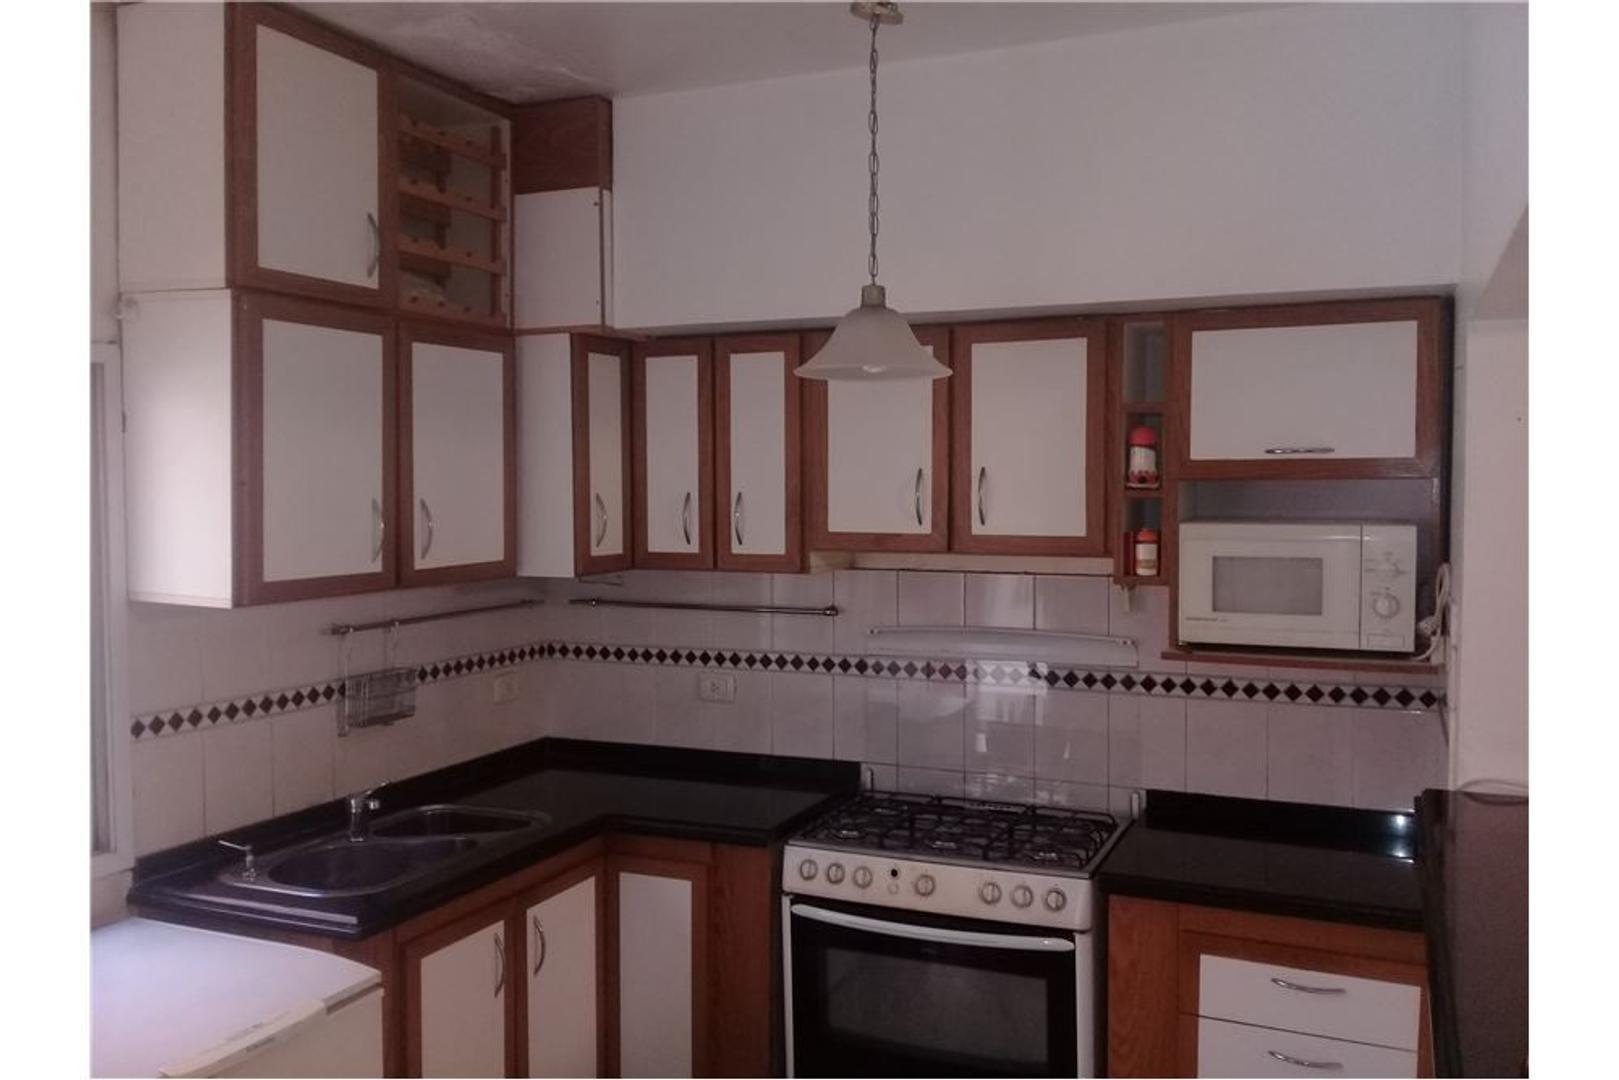 Casa 5 amb Venta o Permuta casa en Ezeiza